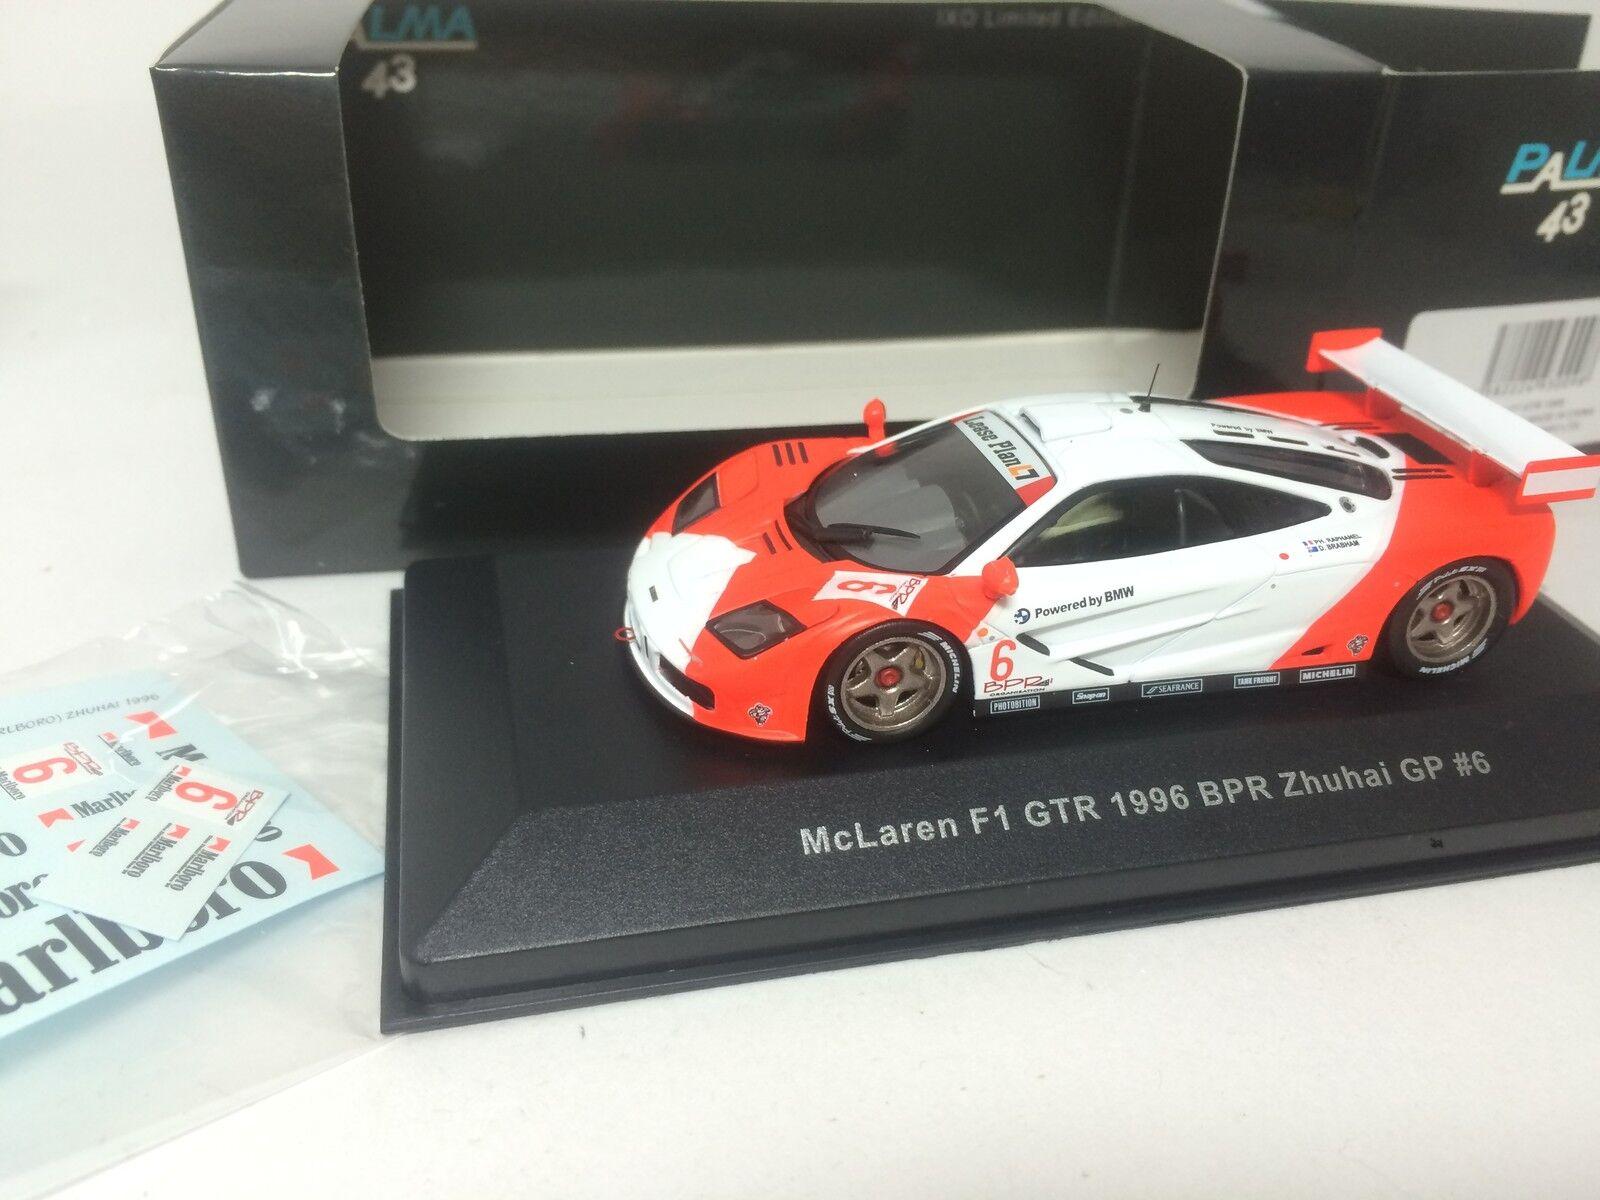 1 43 IXO Palma 43 McLaren F1 GTR 1996  Bpr Zhuhai GP  6 avec autocollant 40009  vente avec grande remise